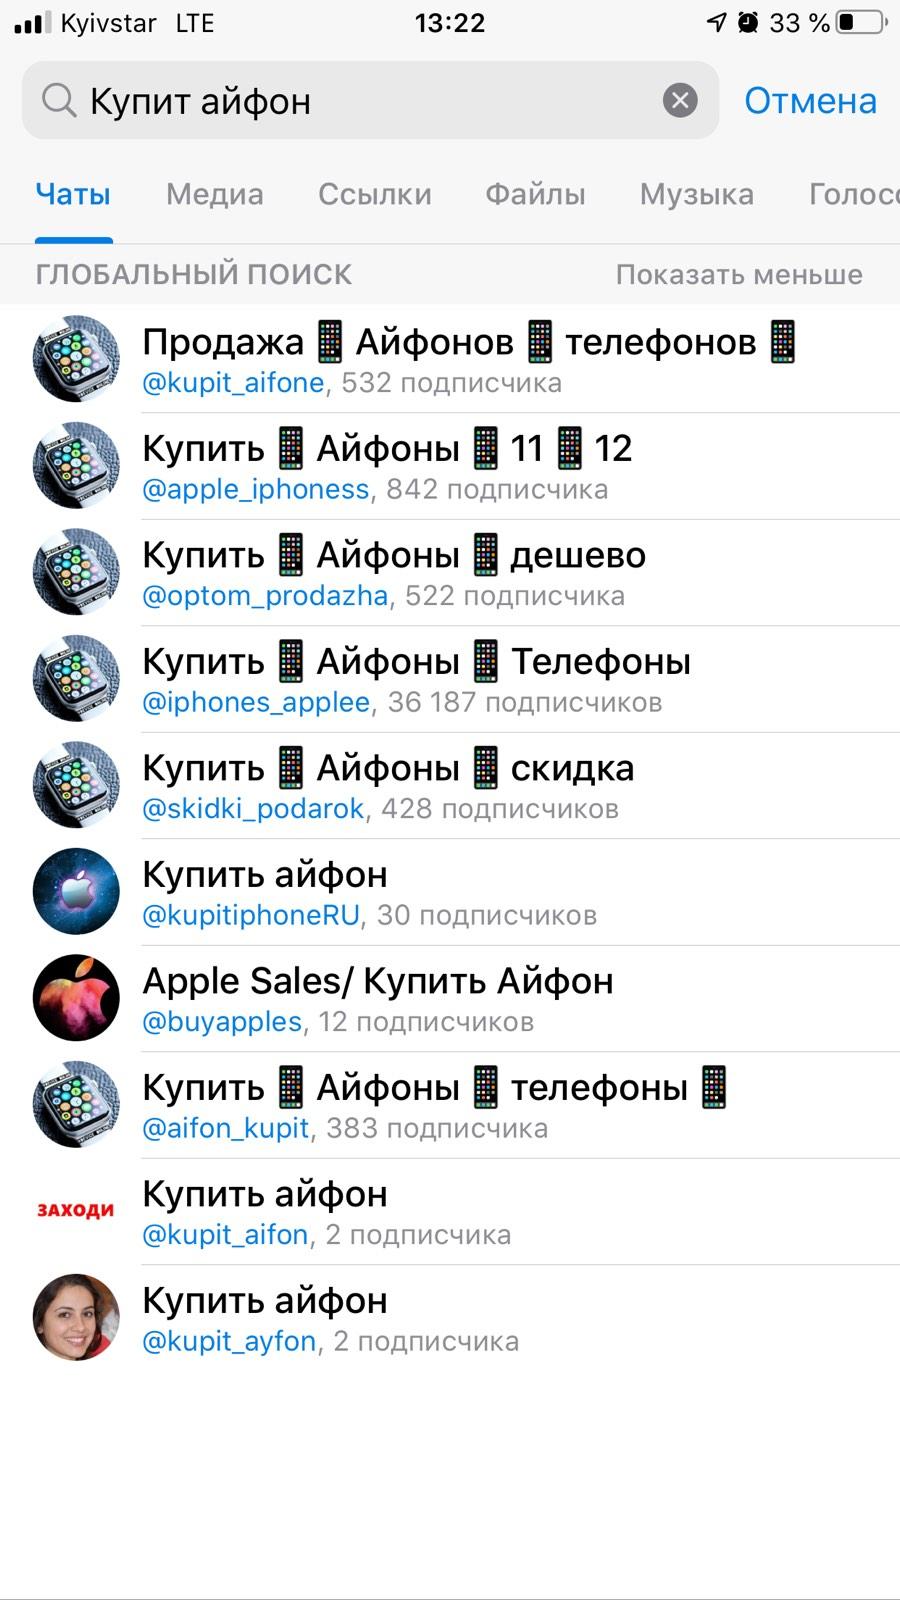 купить айфон1.jpg (220 KB)